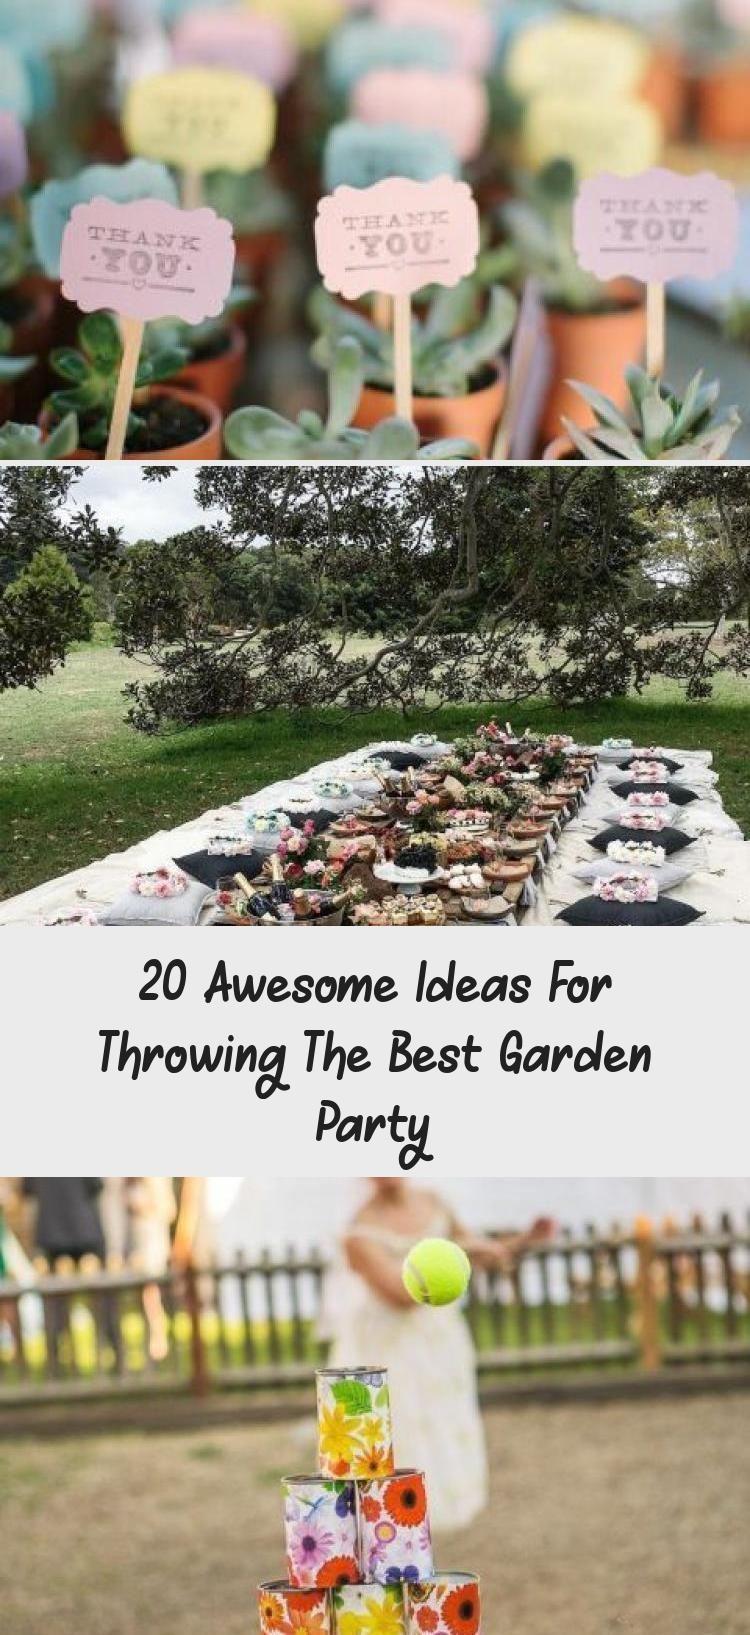 20 Awesome Ideas For Throwing The Best Garden Party - weddingtopia #dekorationFe...,  #amazin...,  #Amazin #amazinggardenideasawesome #Awesome #dekorationFe #Garden #ideas #Party #Throwing #weddingtopia #garden party menu 20 Awesome Ideas For Throwing The Best Garden Party - weddingtopia #dekorationFe...,  #amazin...